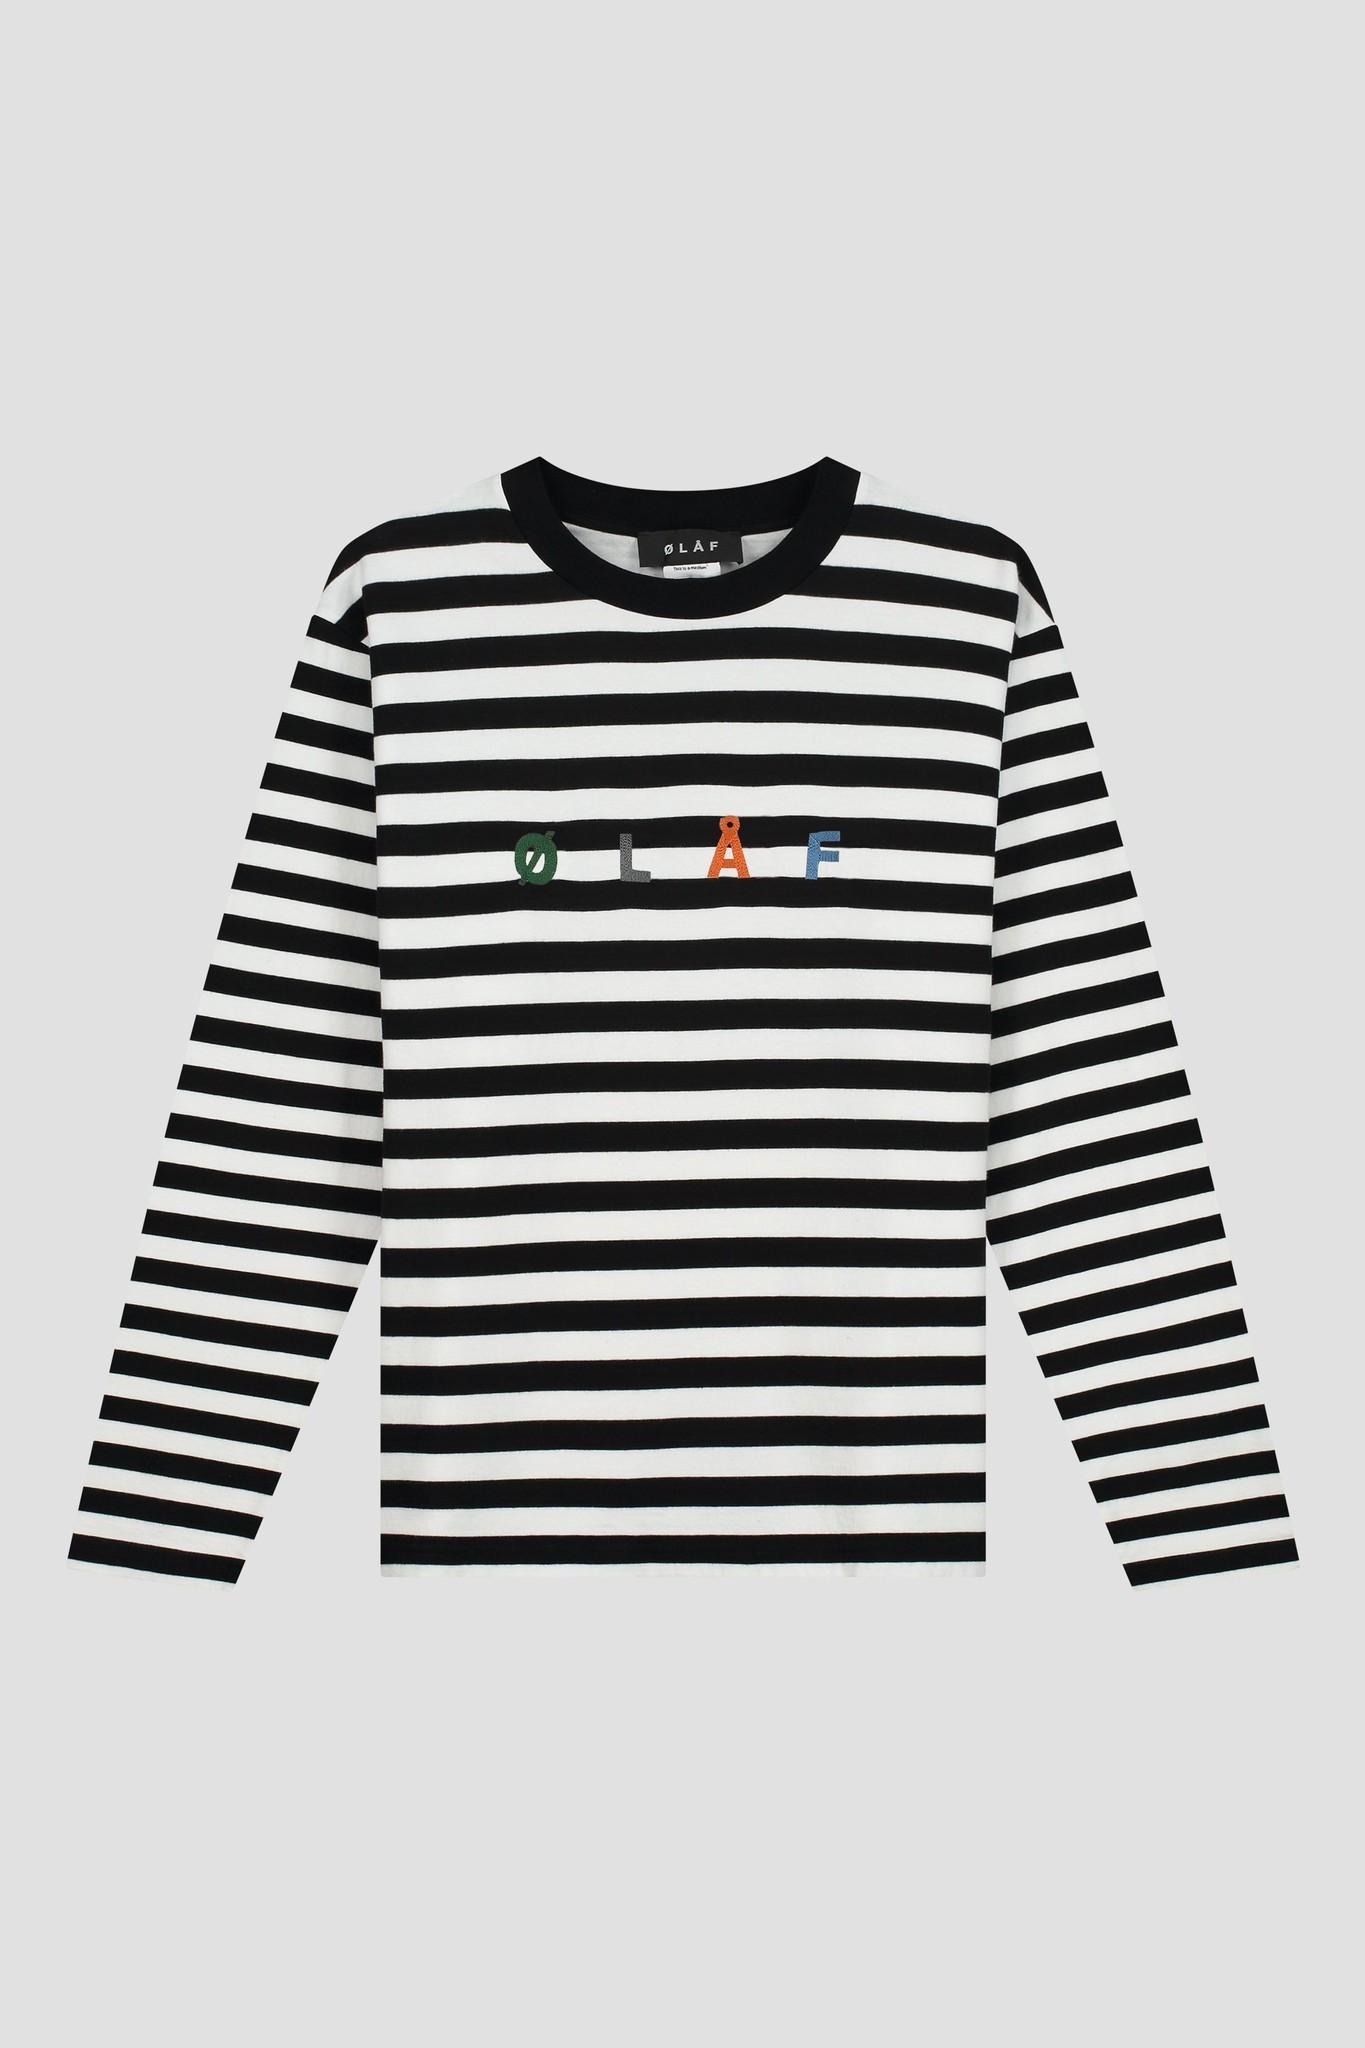 Stripe Sans LS Tee - White / Black-1